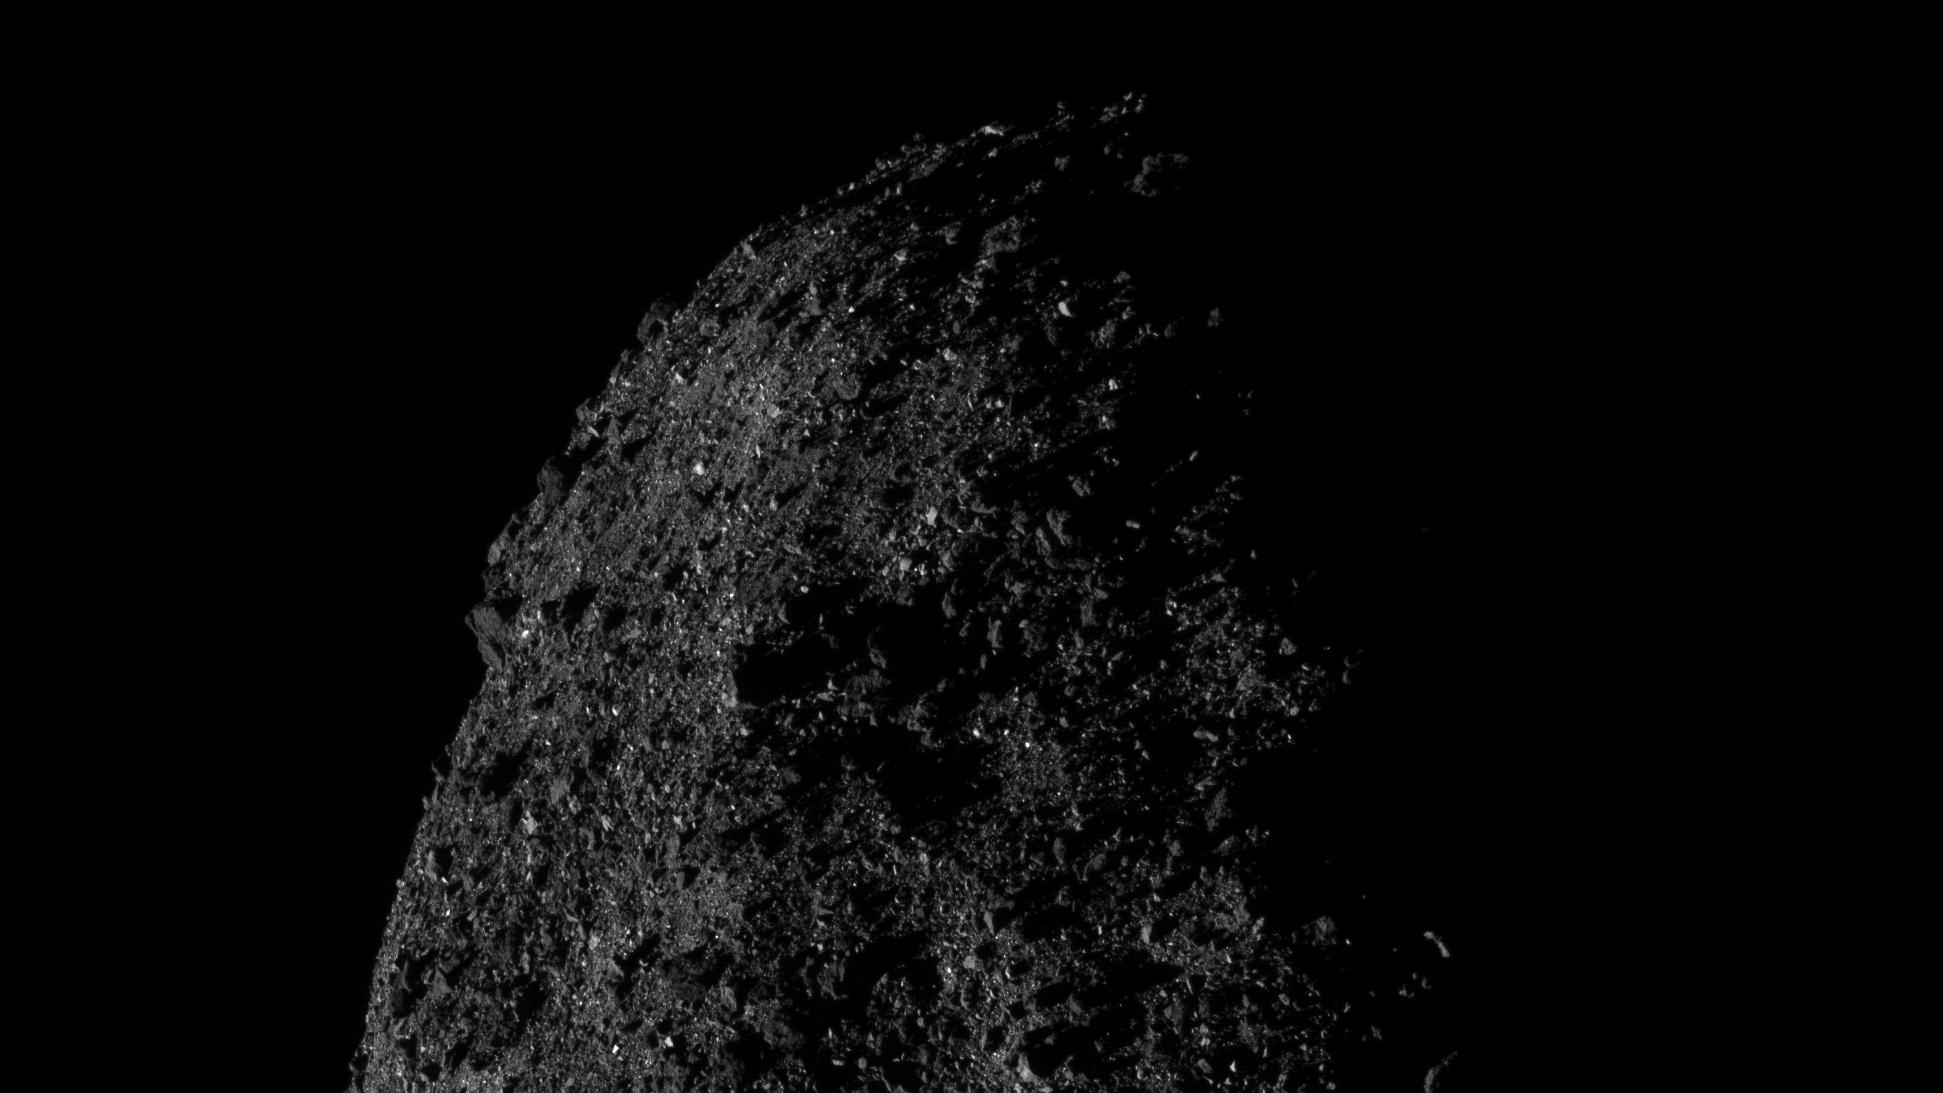 NASA's OSIRIS-REx Spacecraft Takes Stunning Photo Of Asteroid Bennu From Just 0.4 Miles Away